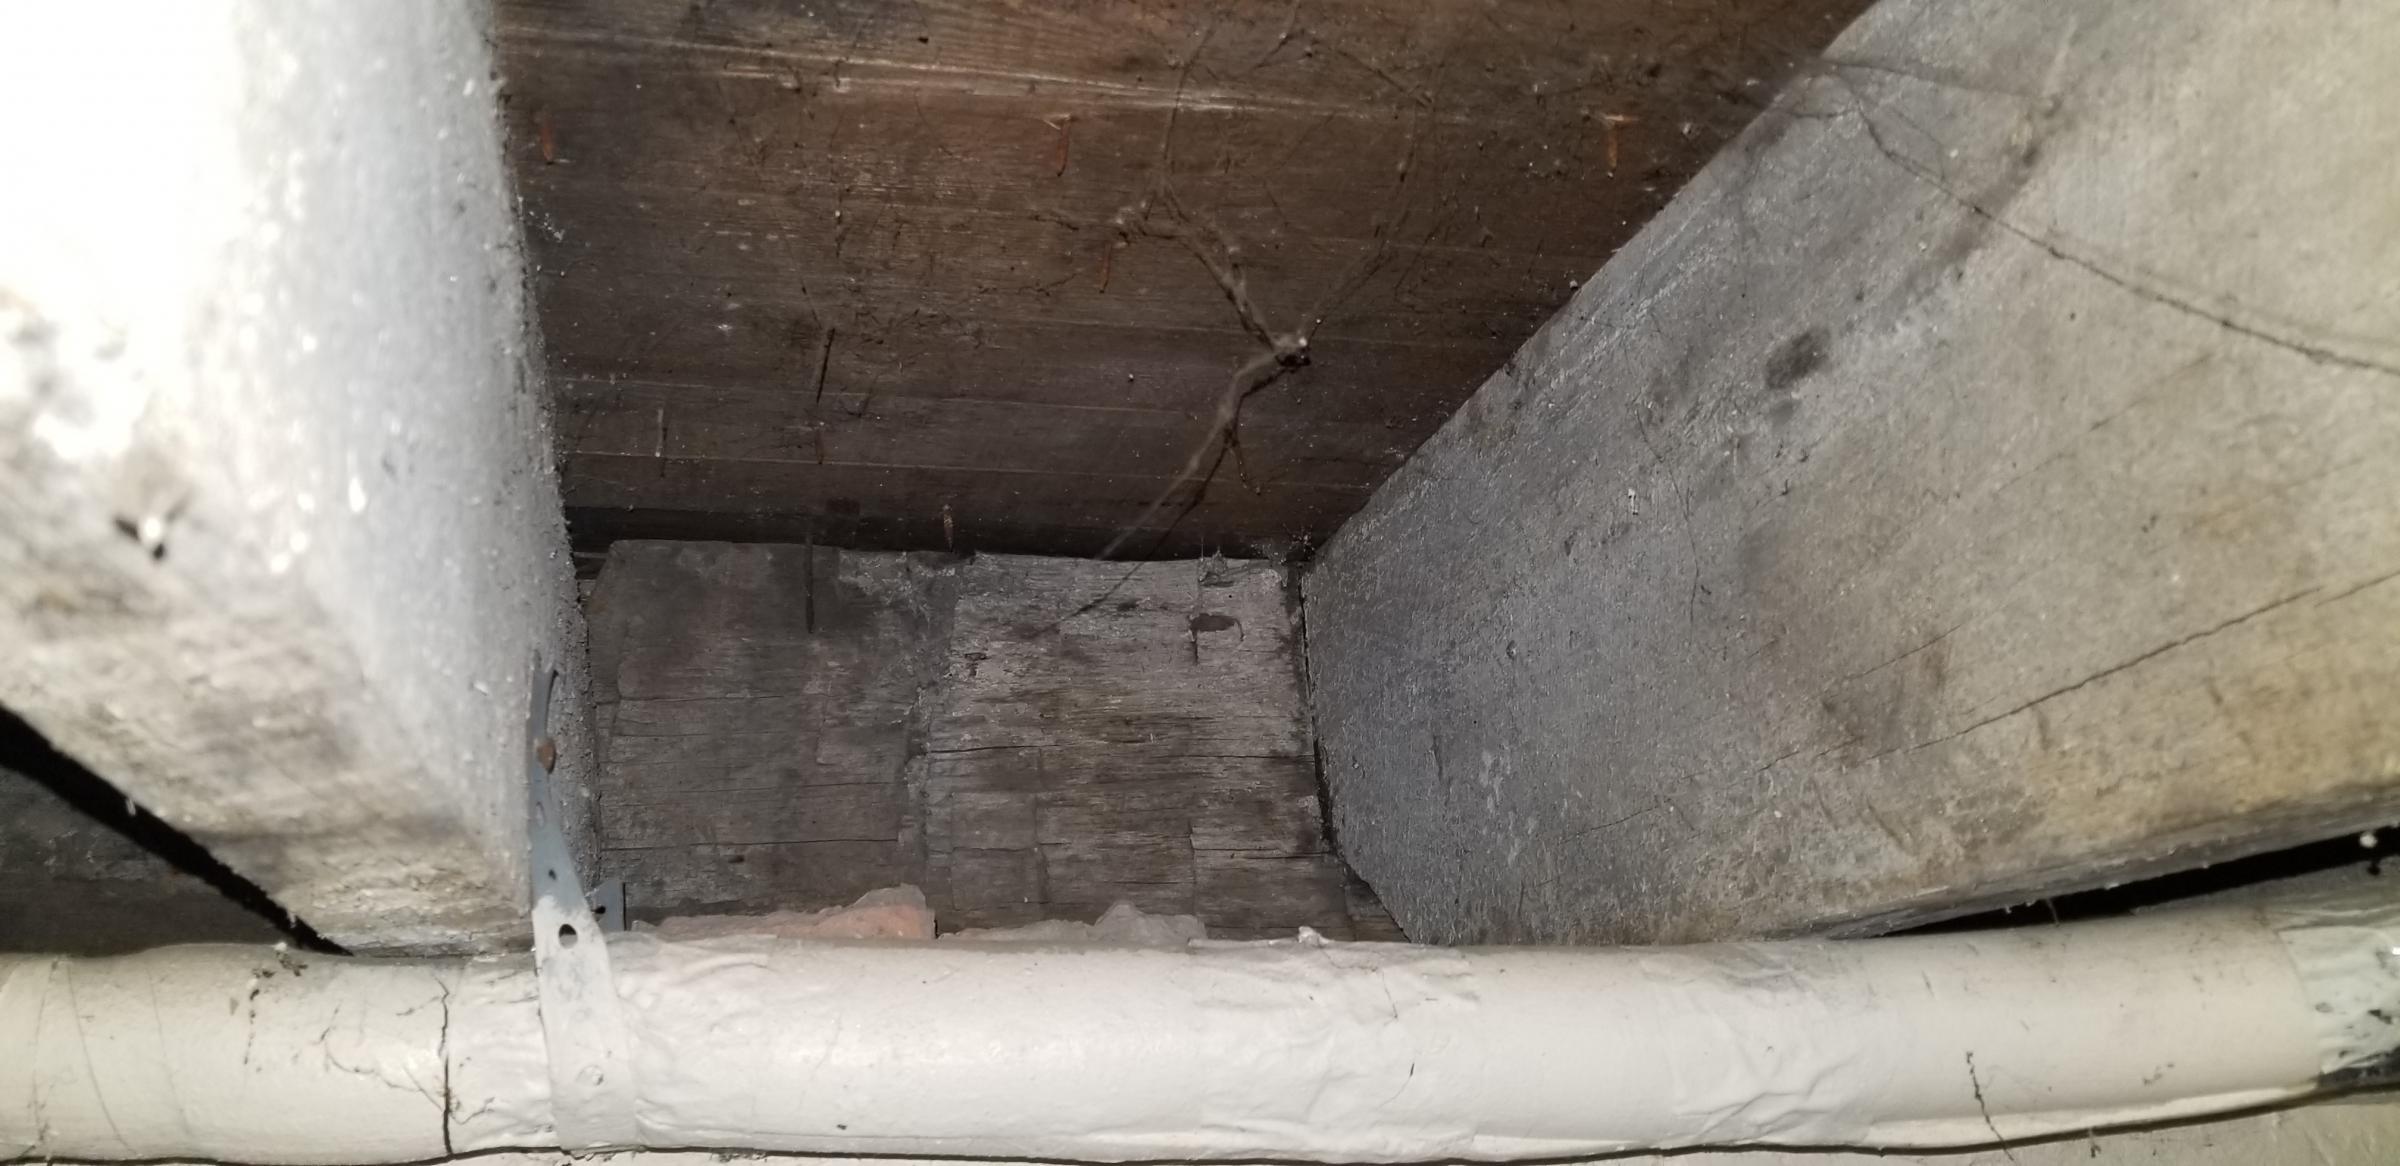 Adding 2x8 studs to 100 year old 2x4 walls-20181229_174335_1546124363357.jpg